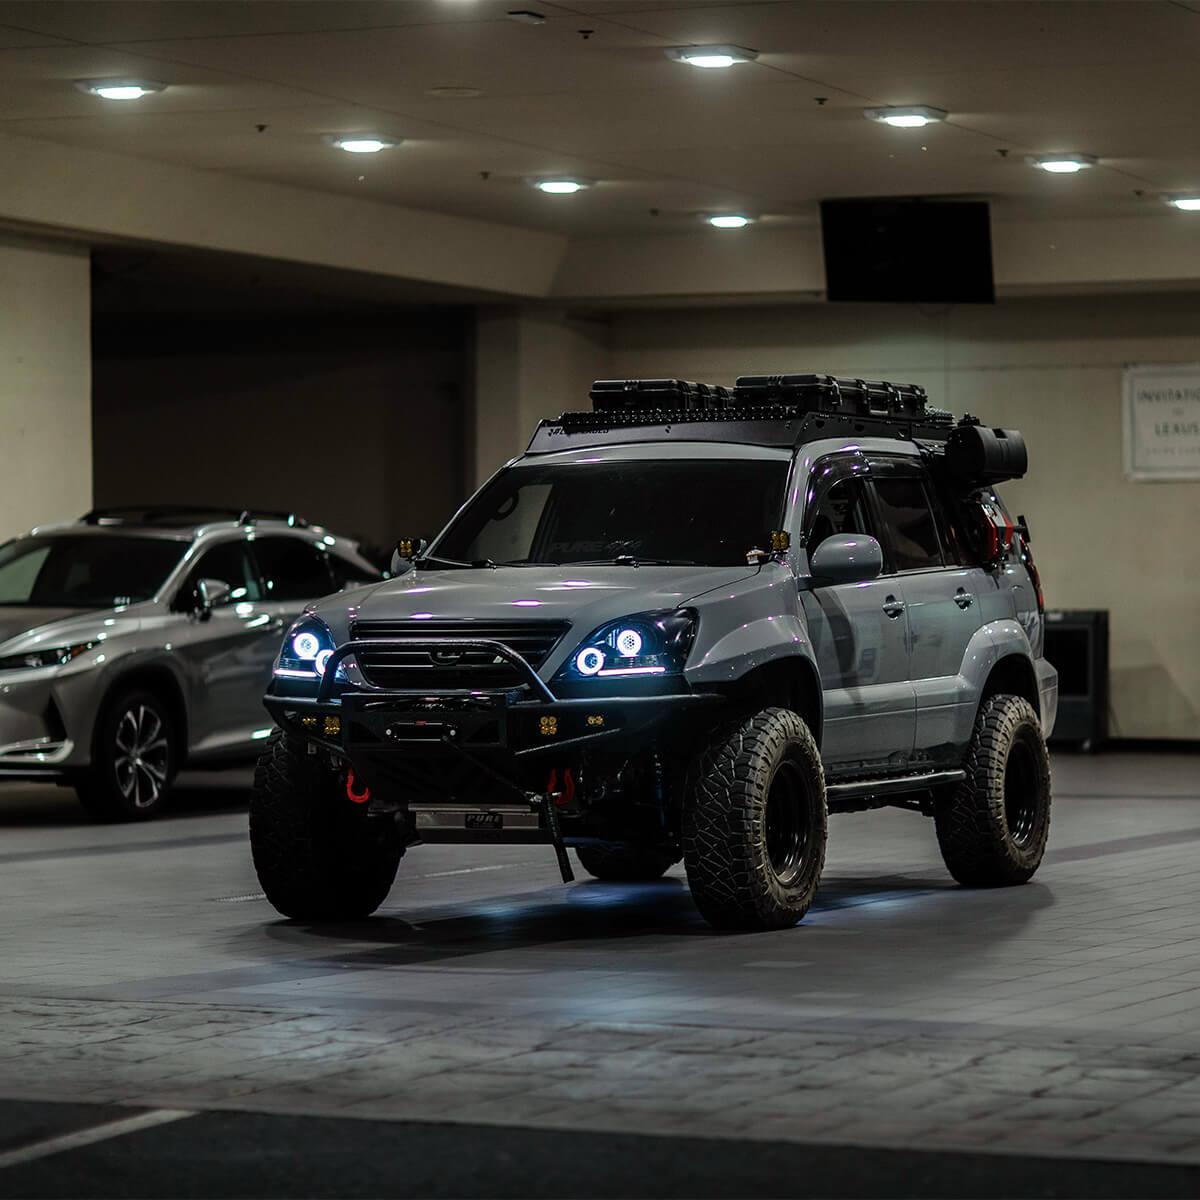 BX Built custom headlights with halo rings - Lexus GX470